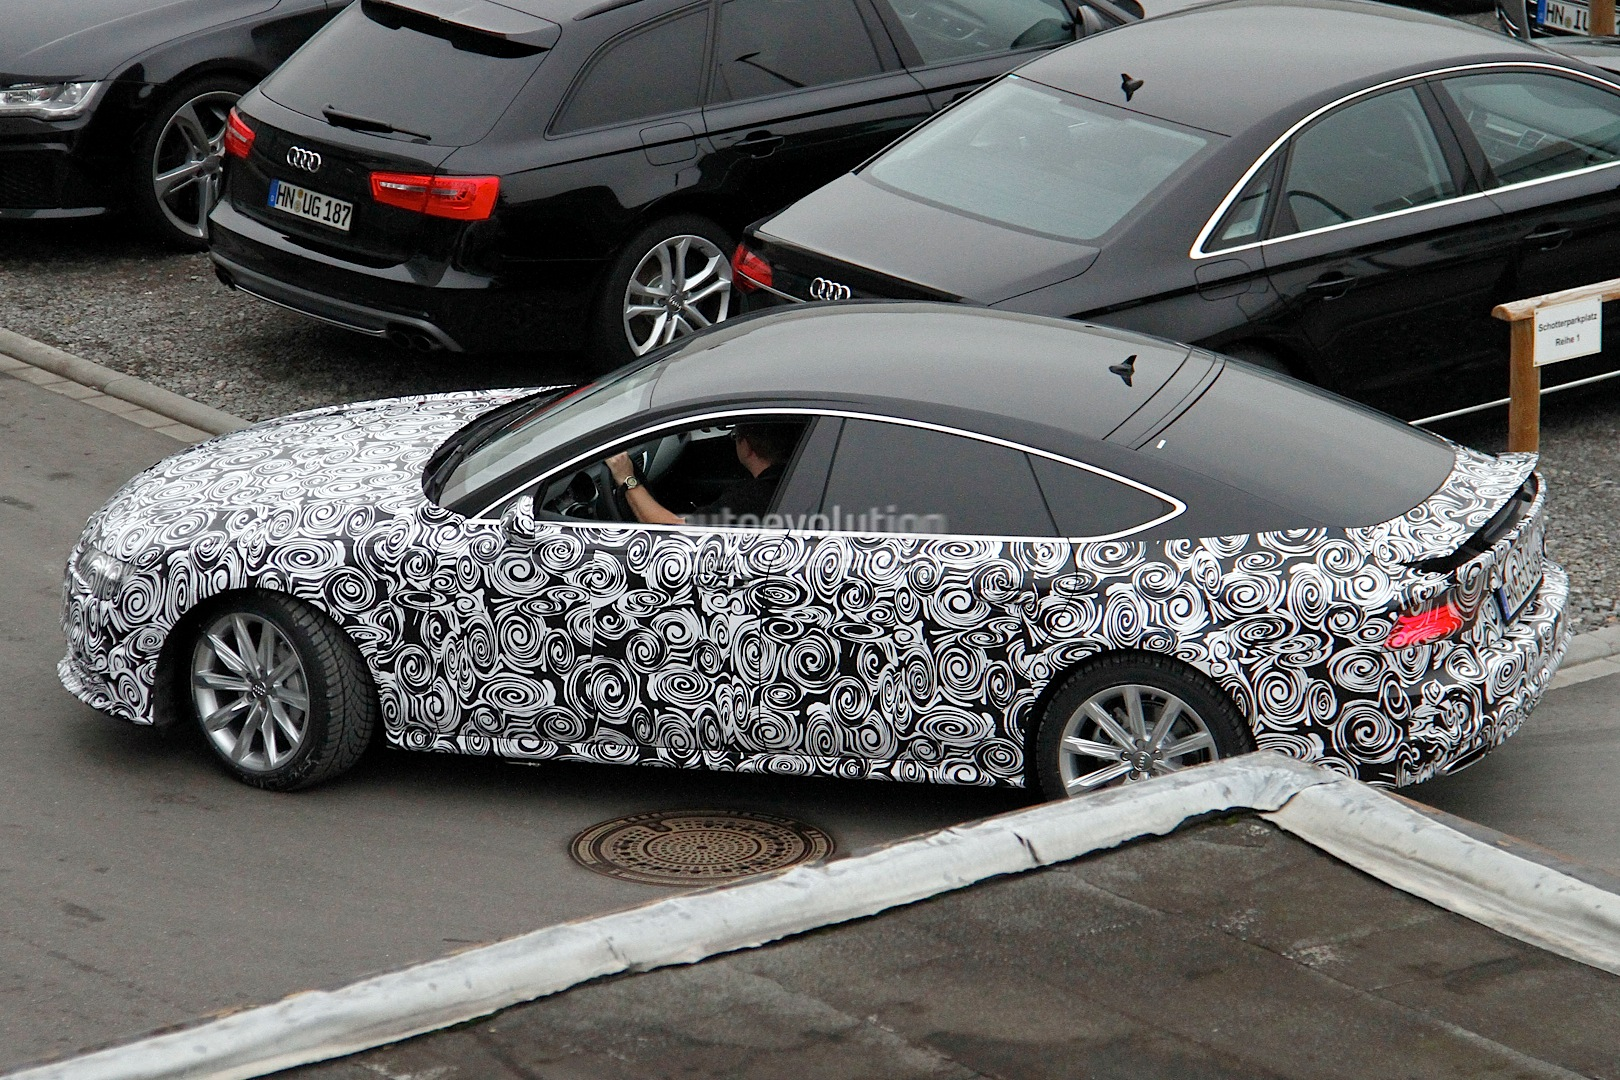 2014 - [Audi] A7 & S7 Sportback Restylée Spyshots-audi-a7-facelift-gets-new-headlight-design-1080p-3